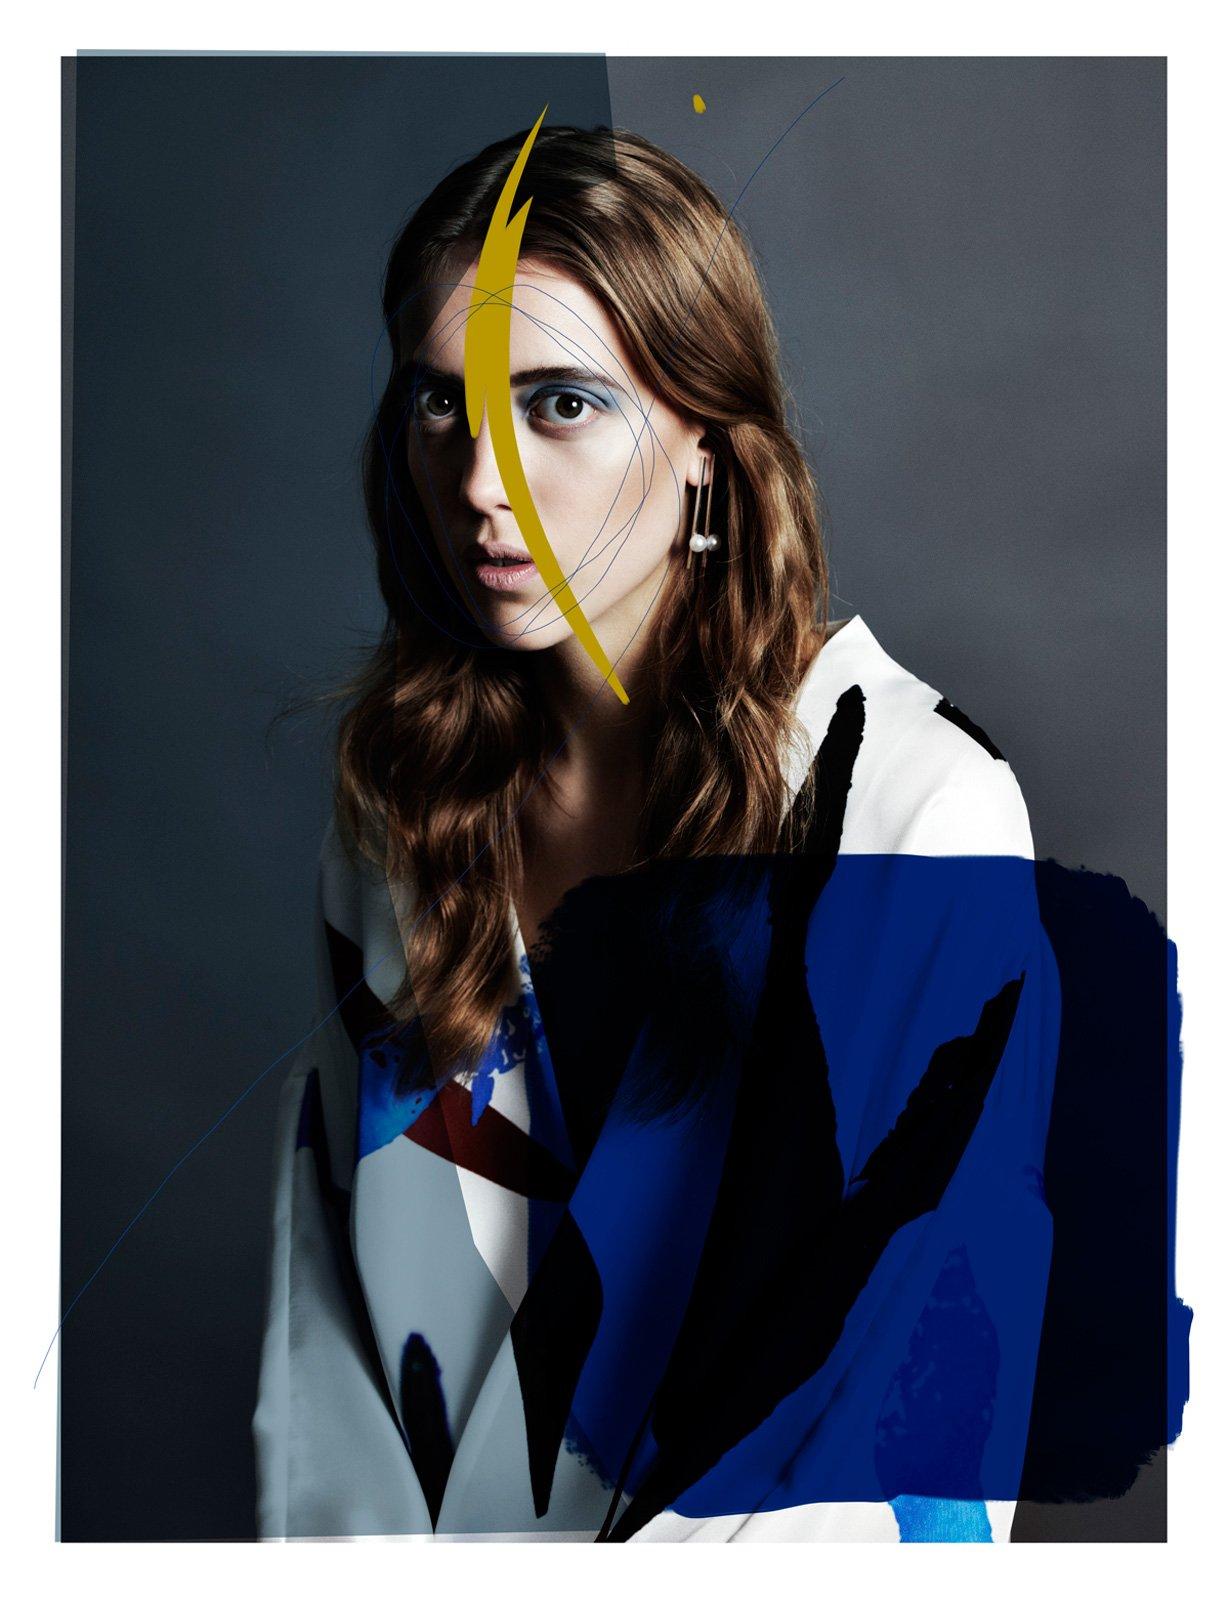 ignant-photo-lea-nielsen-fashion-photography-03